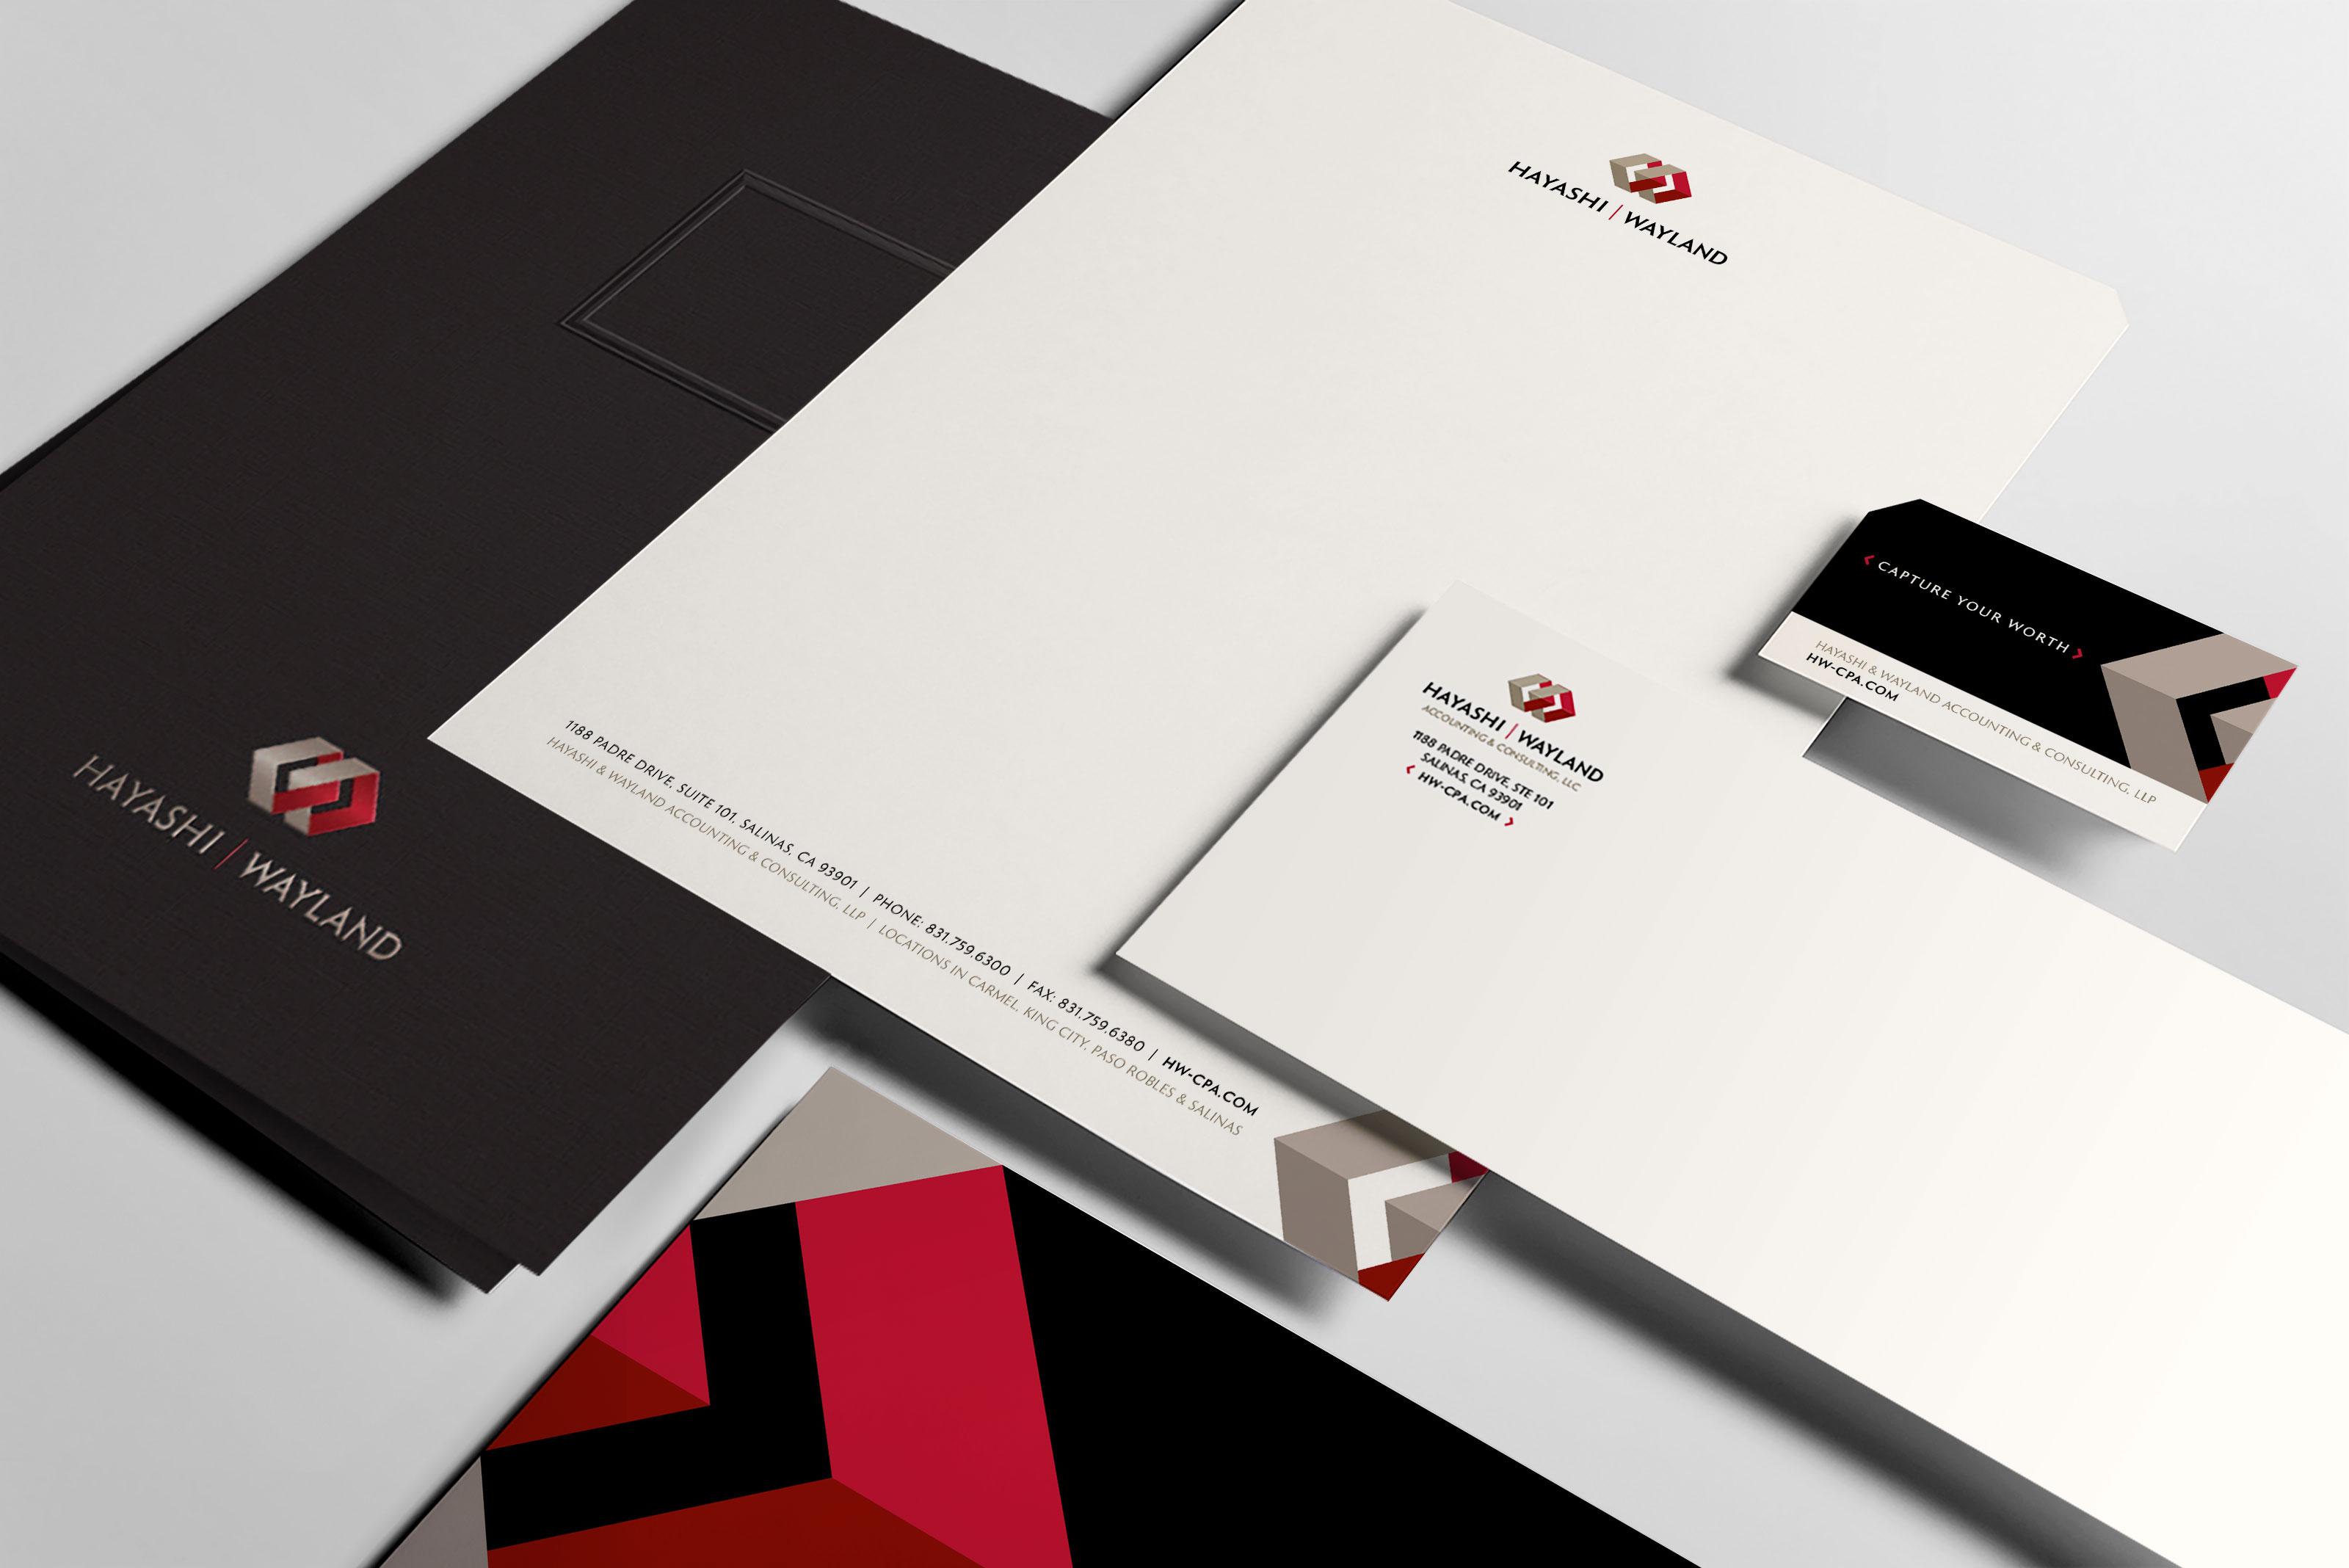 Hayashi Wayland Accounting Firm Stationery Design